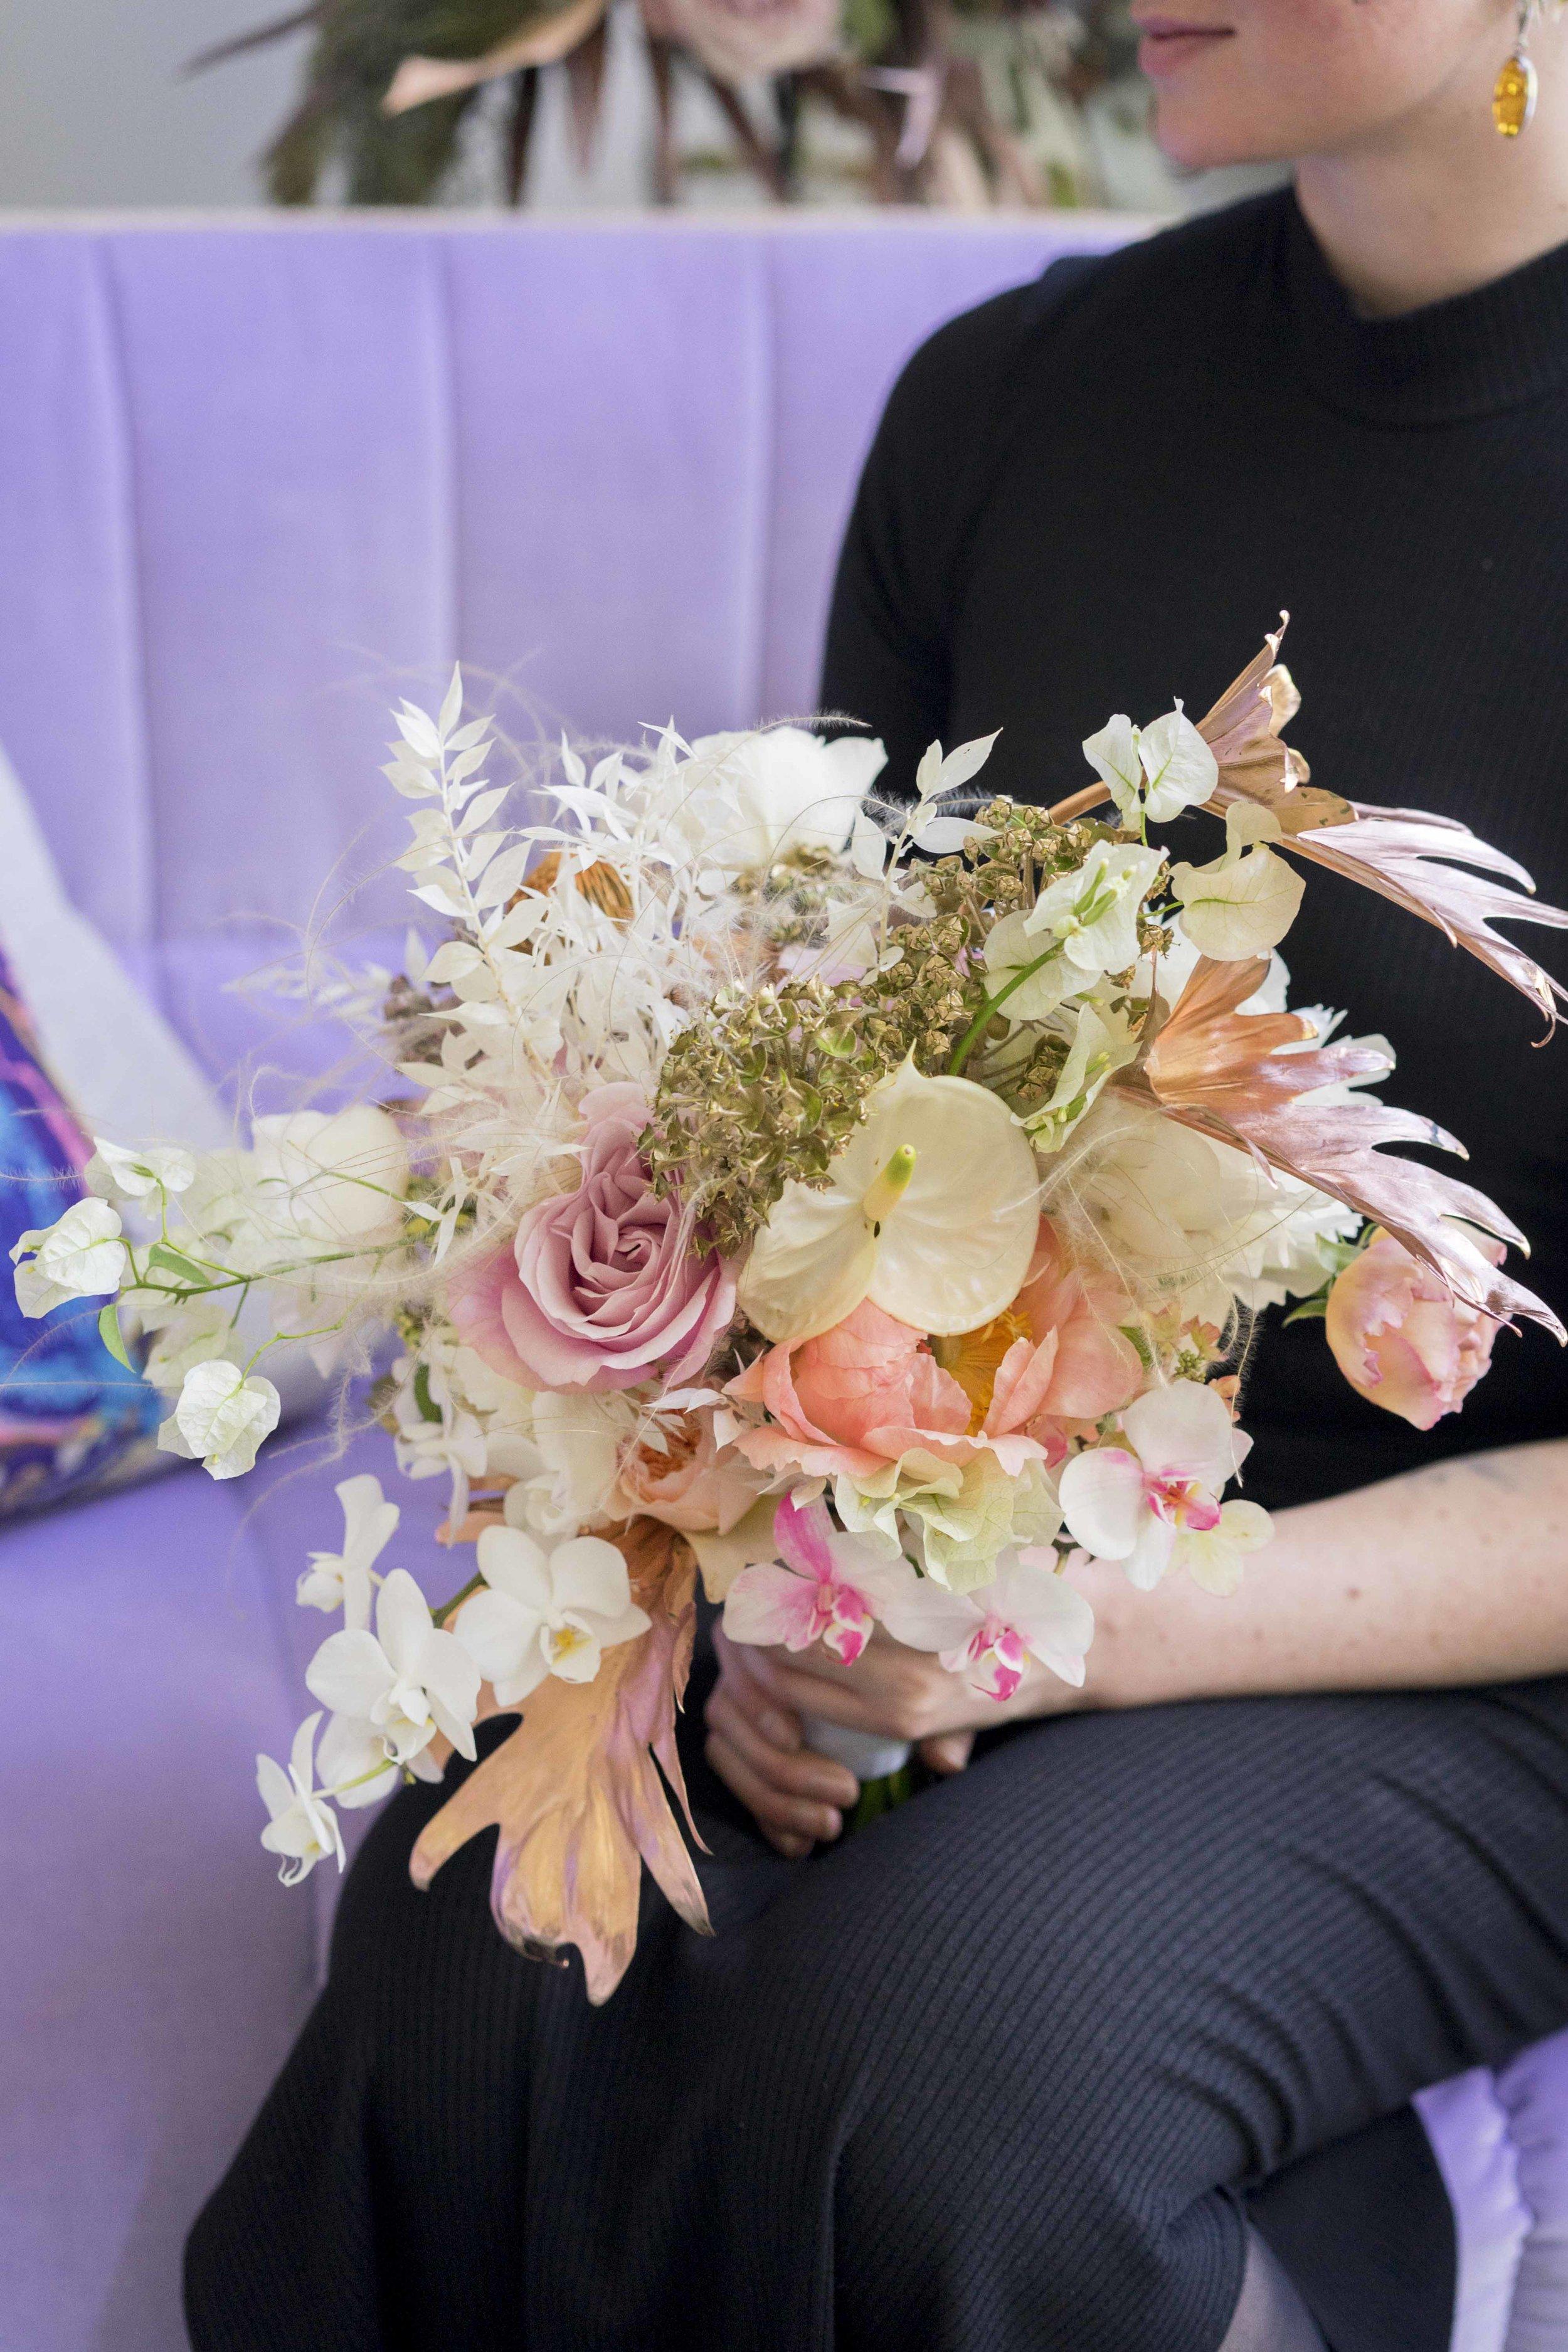 #apbloem #florist #bloemist #amsterdam #bridalbouquet #bloemen #kerkstraat #trouwen #event #love #liefde #bloemen #flowers #wedding #bruiloft #dscolor #dsfloral #weddingstyling #peony #styling #bruidsboeket